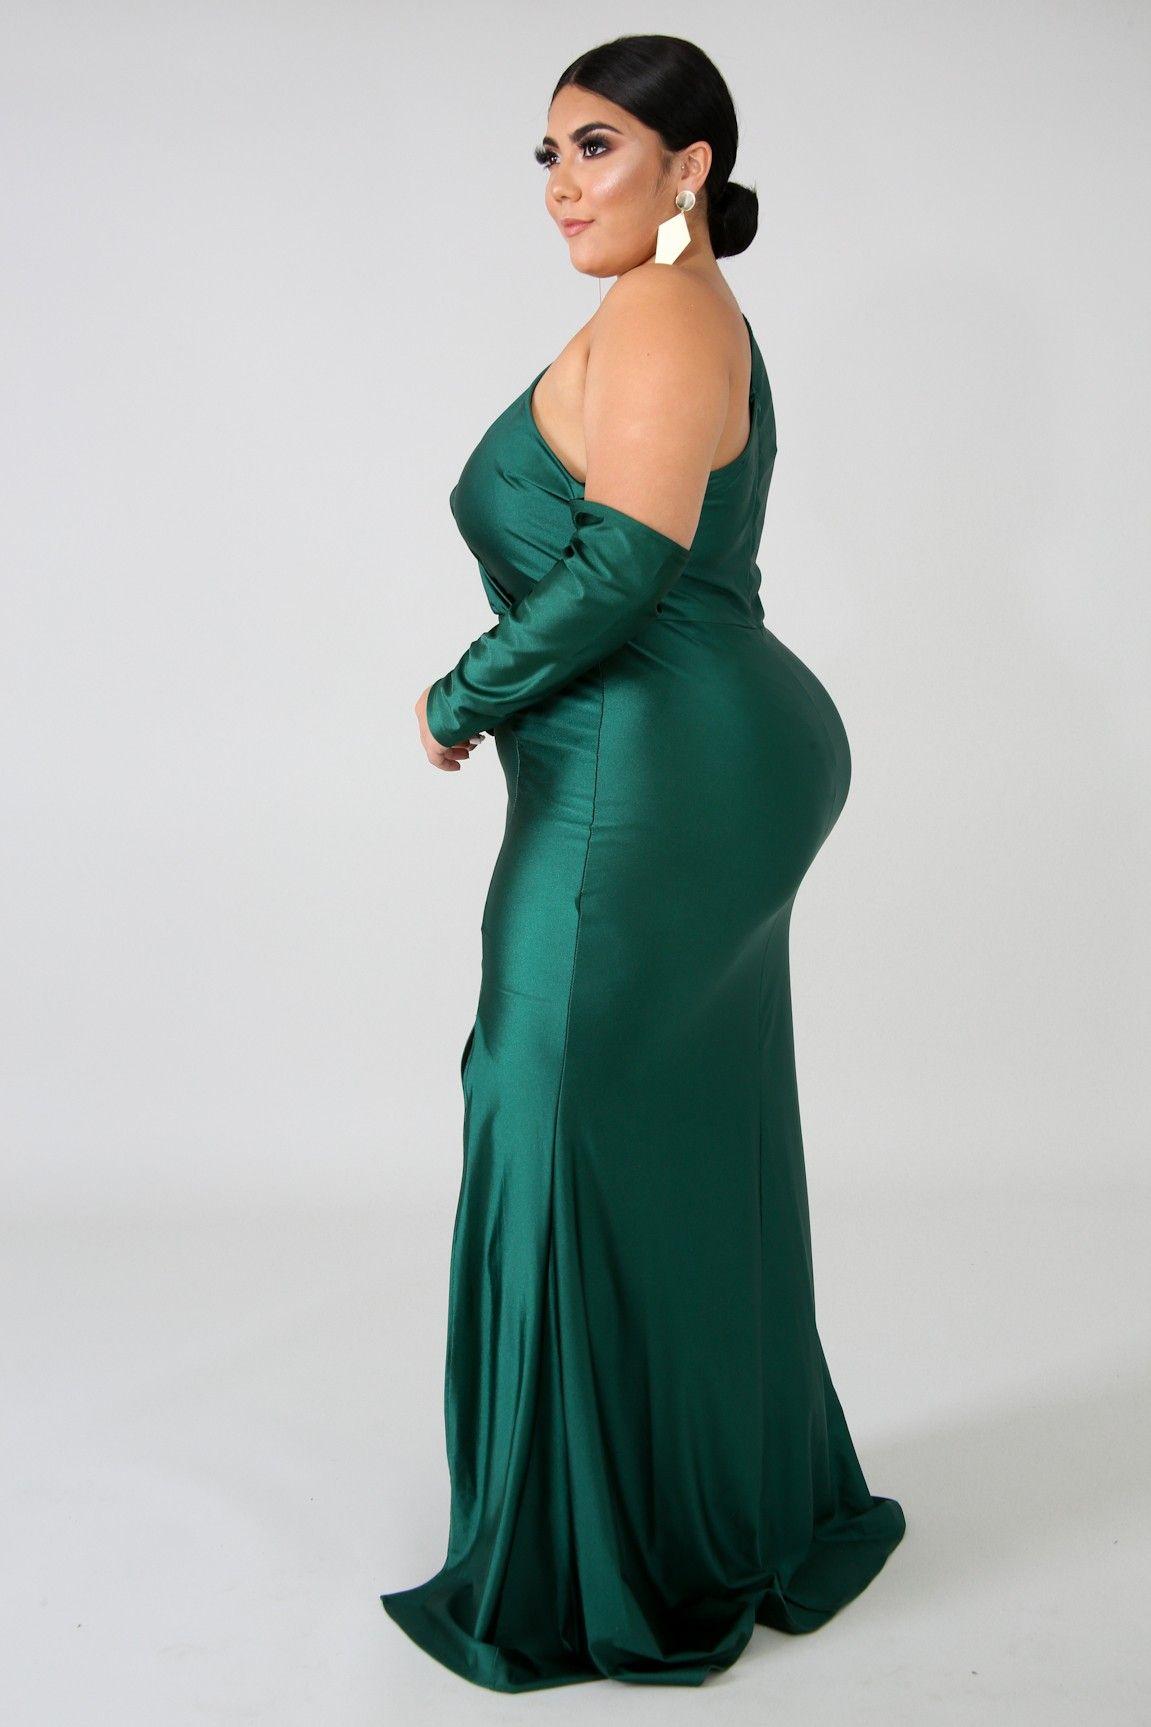 67c3d2a509f Sasha Slit Maxi Dress Maxi Dress With Slit